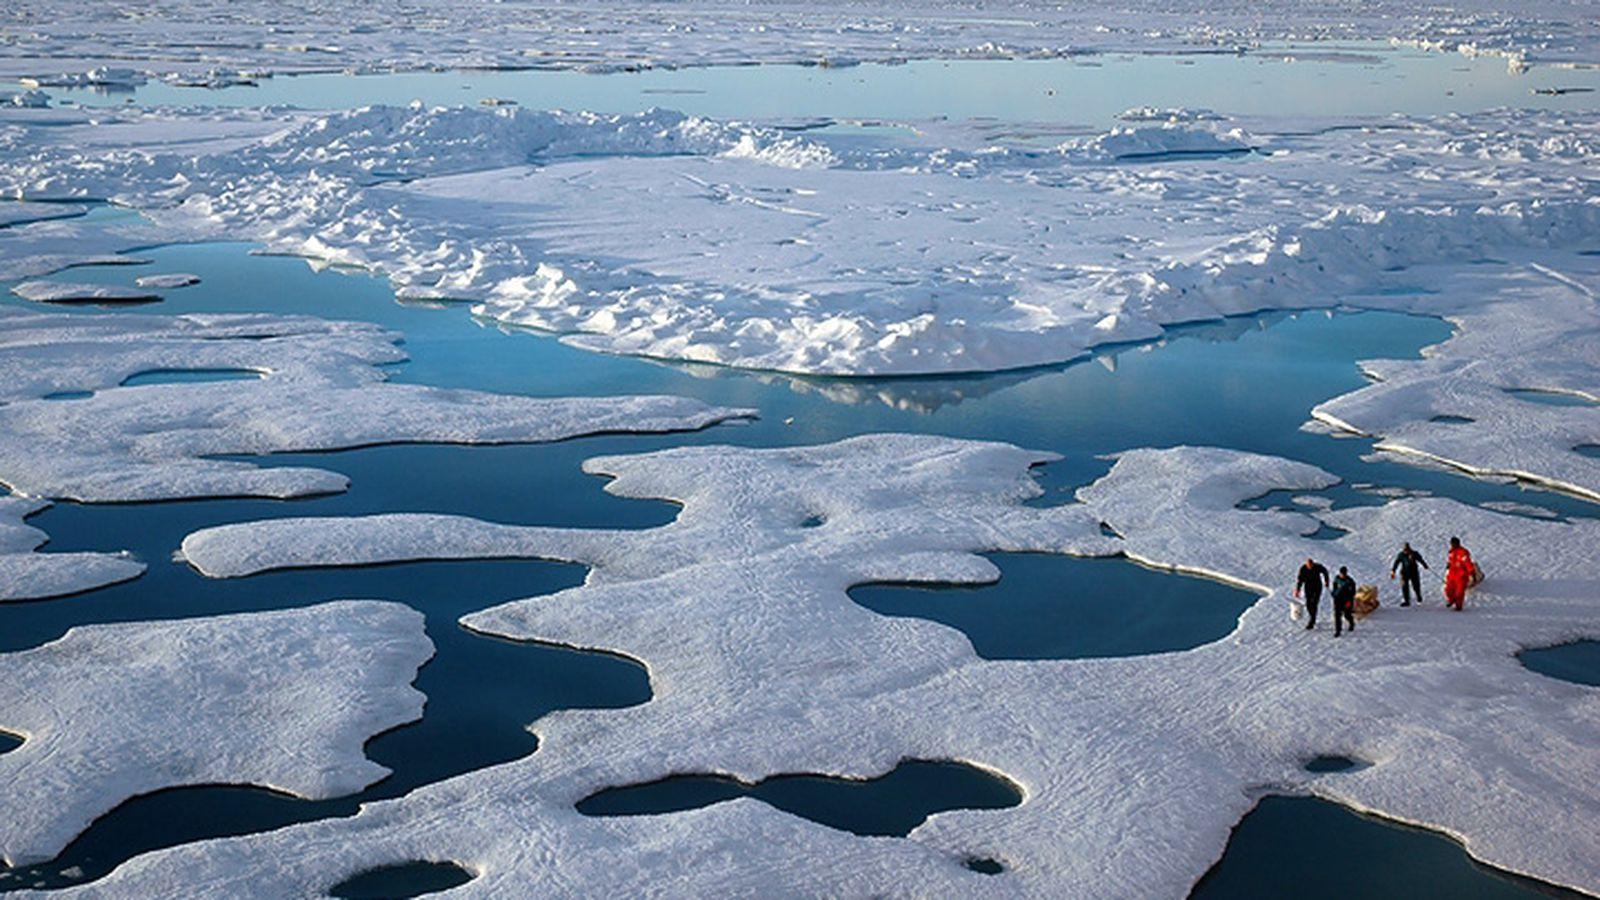 Melting ice, shifting microbes